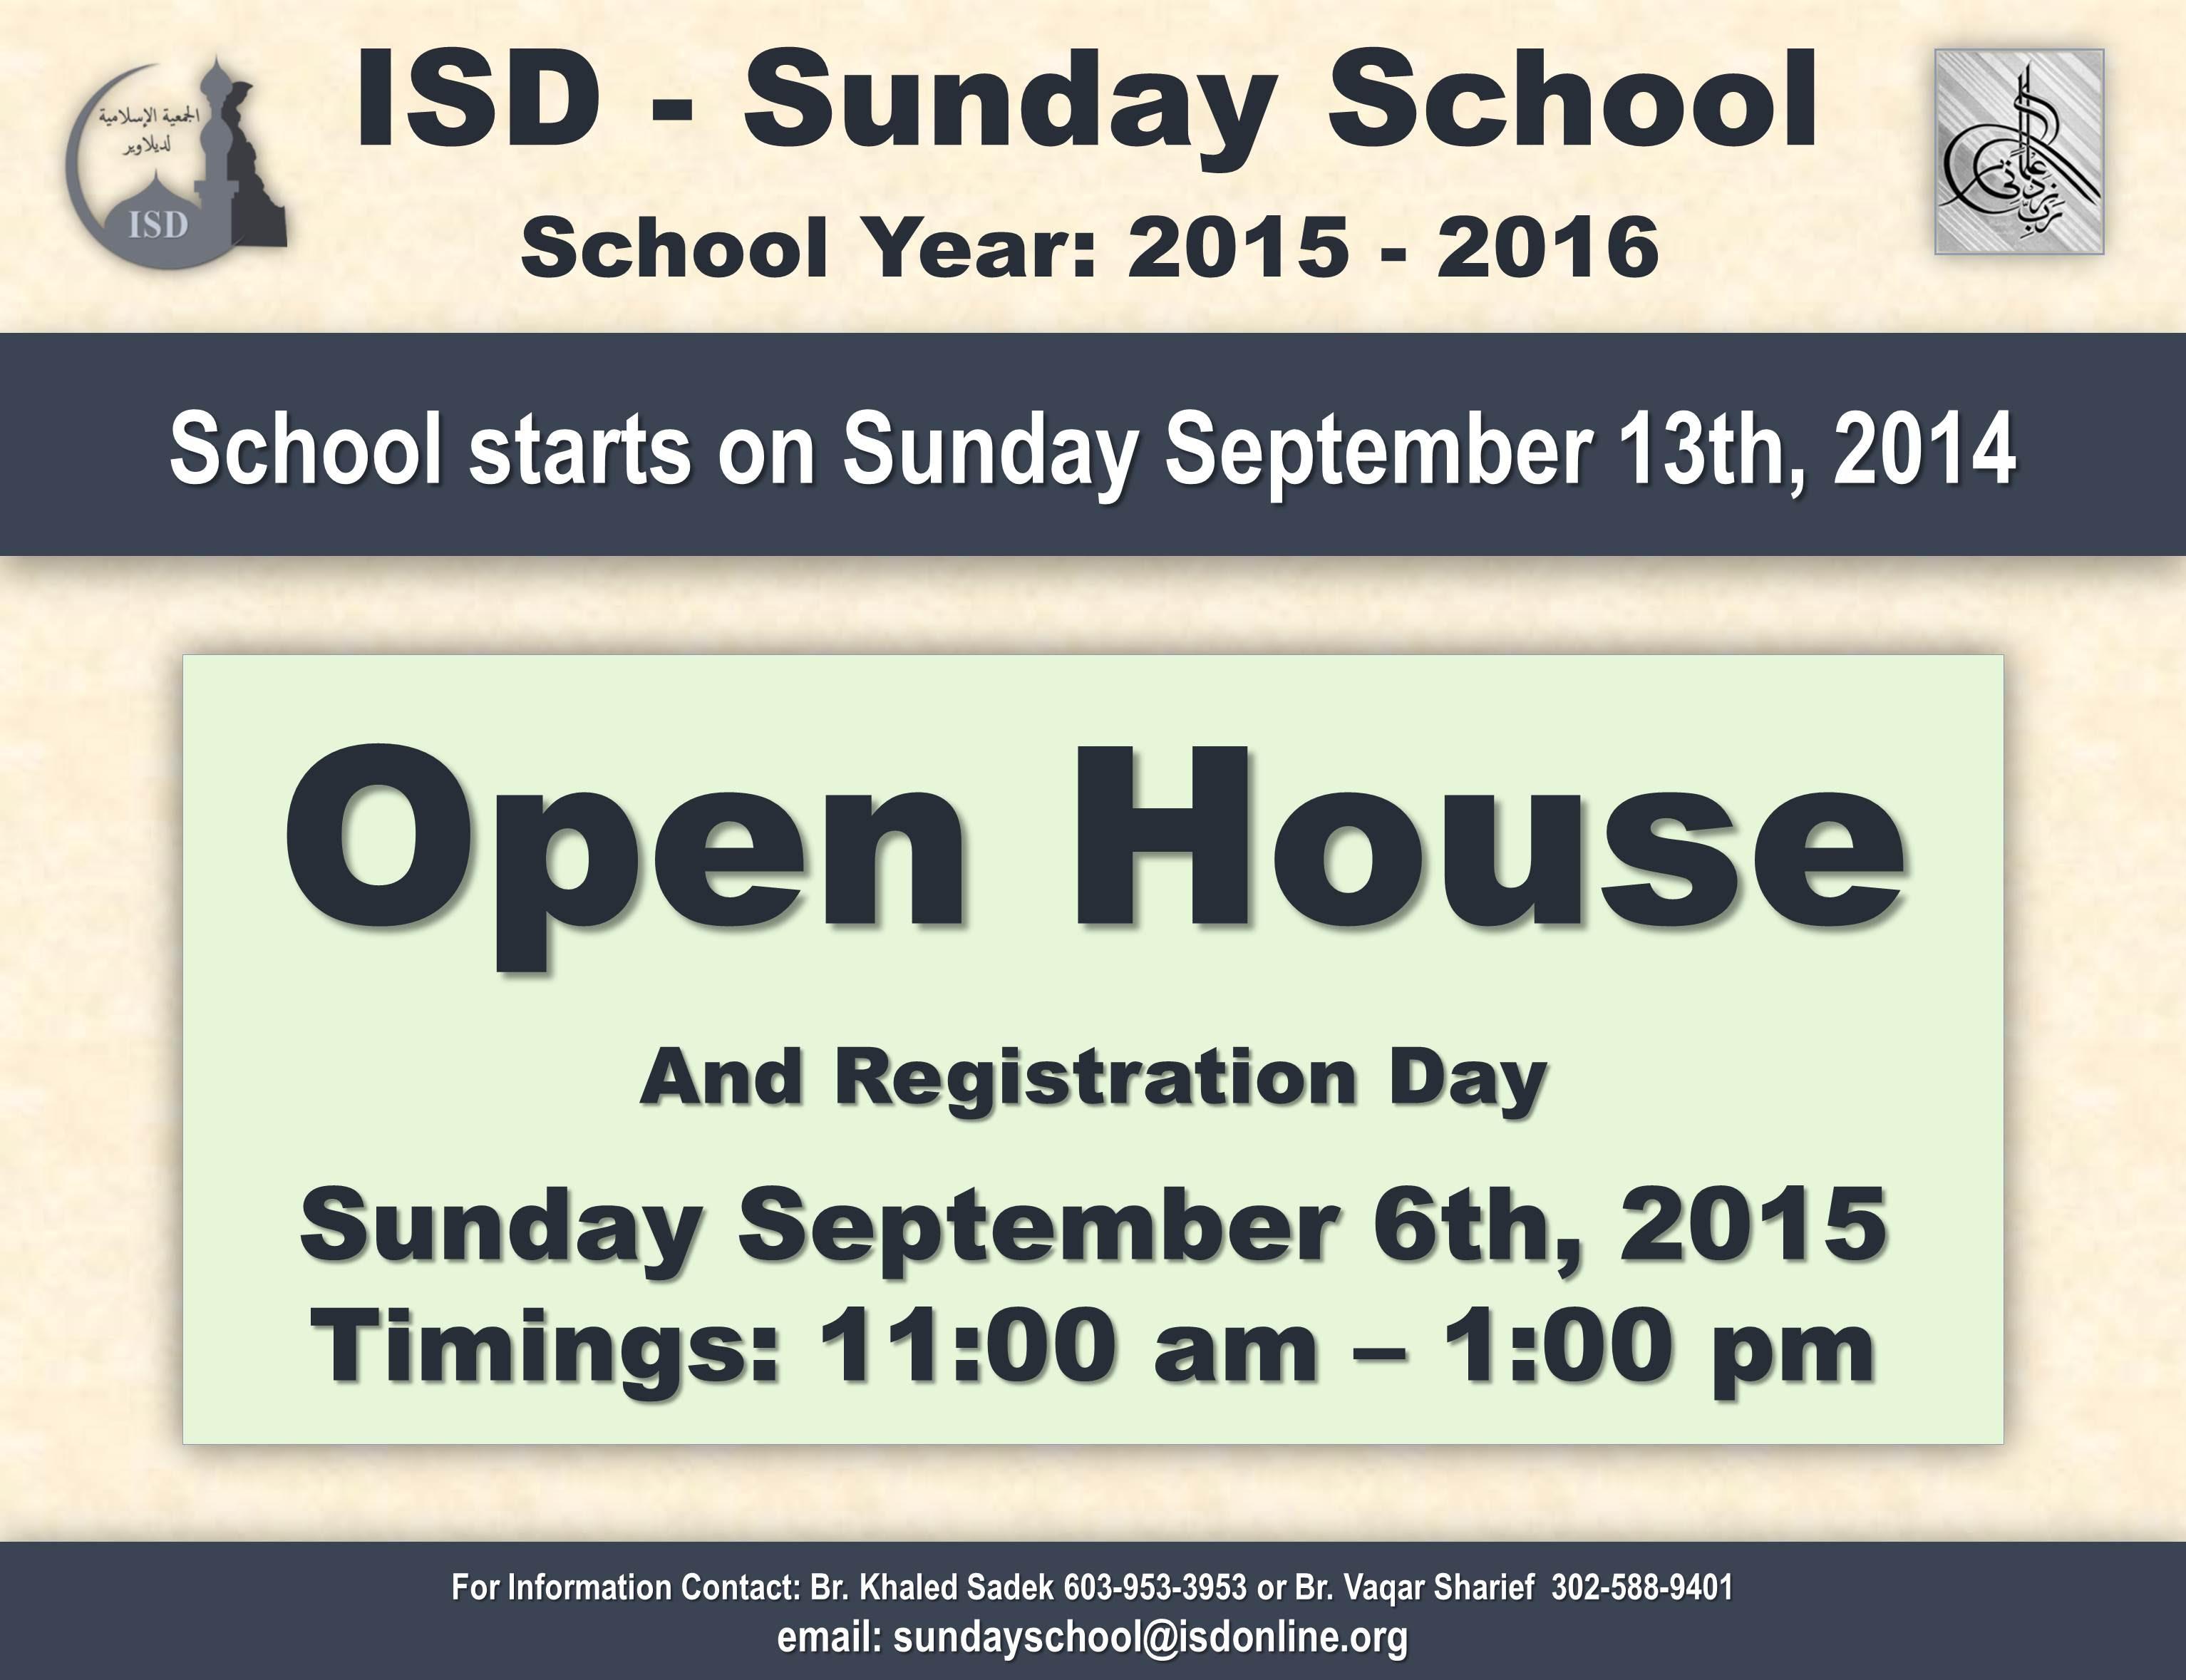 SundaySchoolOpenHouse2015